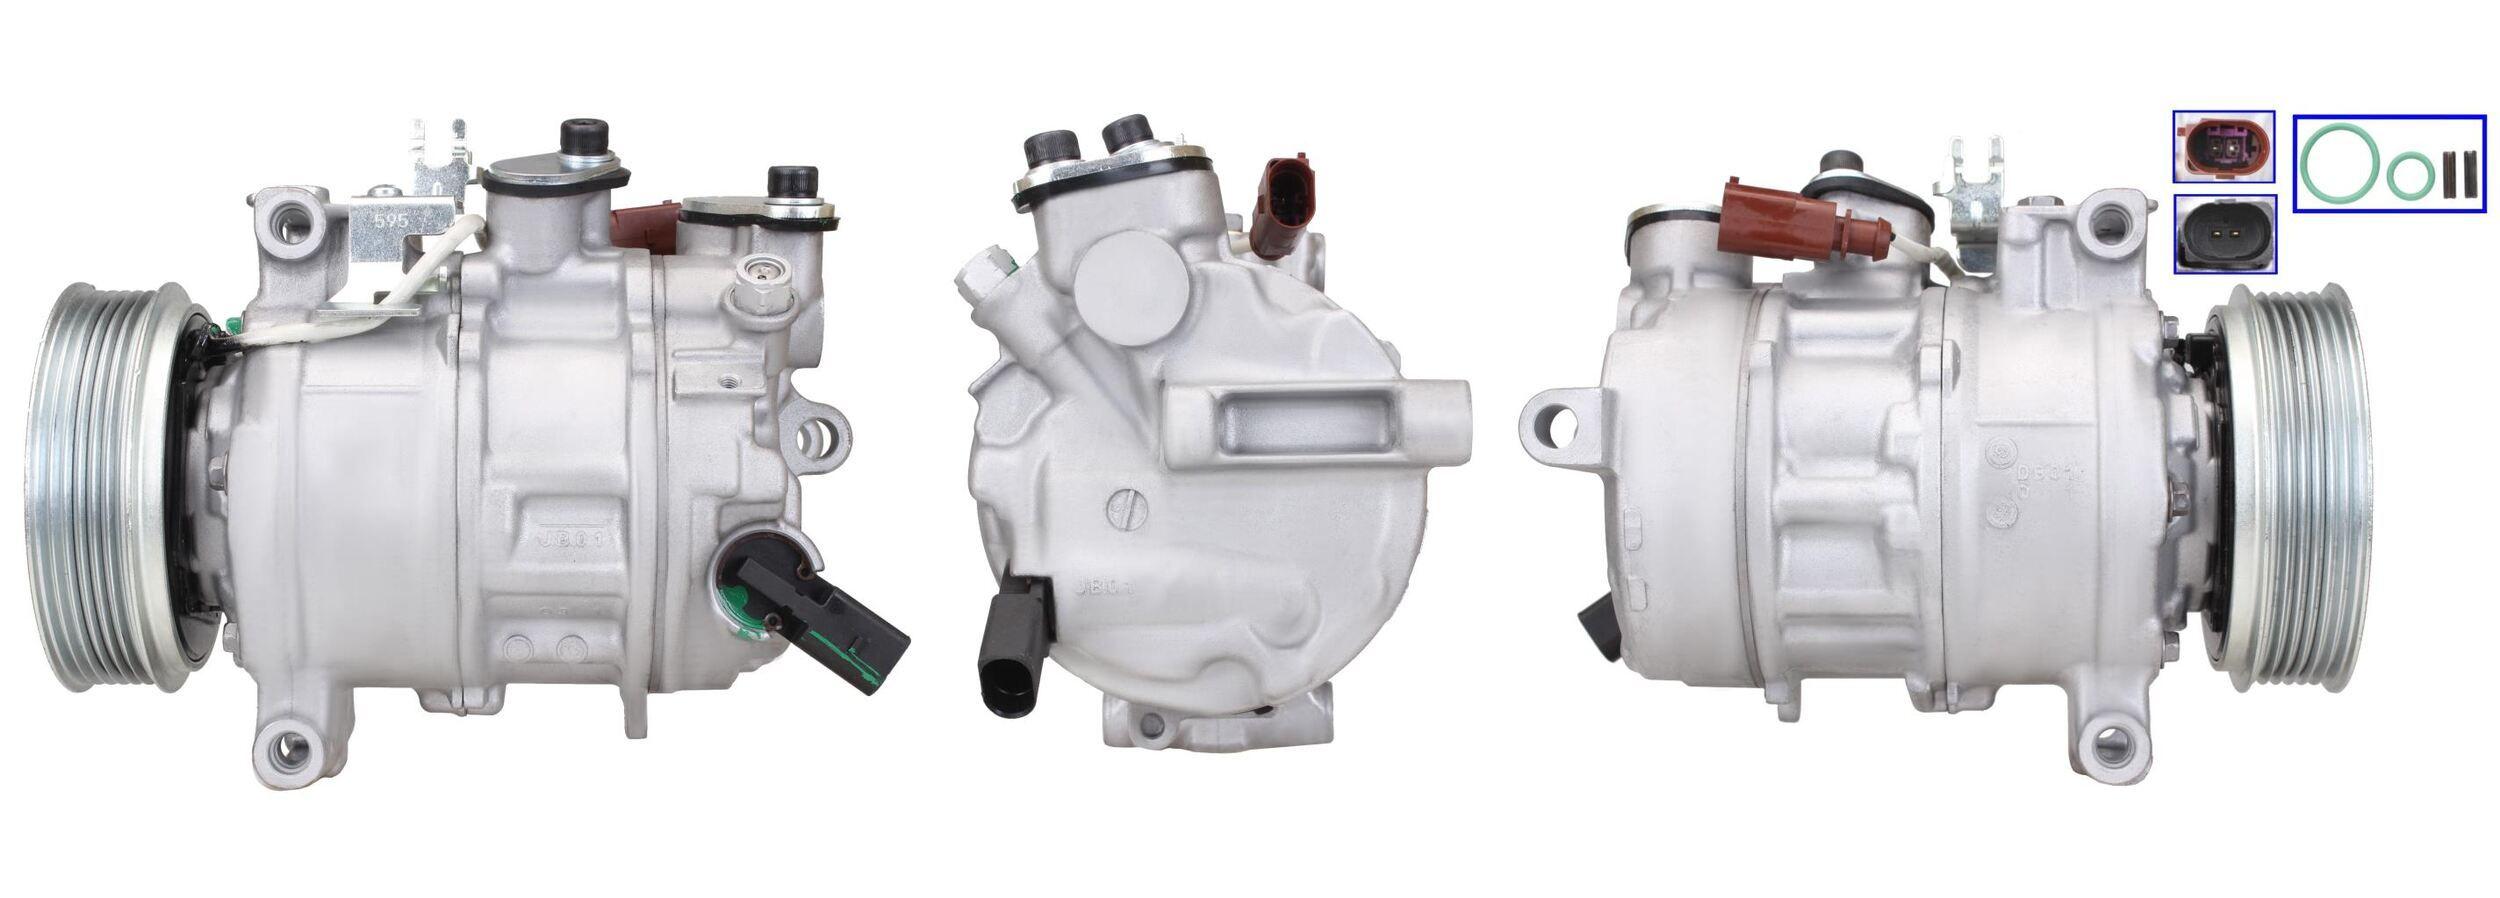 Original AUDI Kompressor Klimaanlage 51-0966